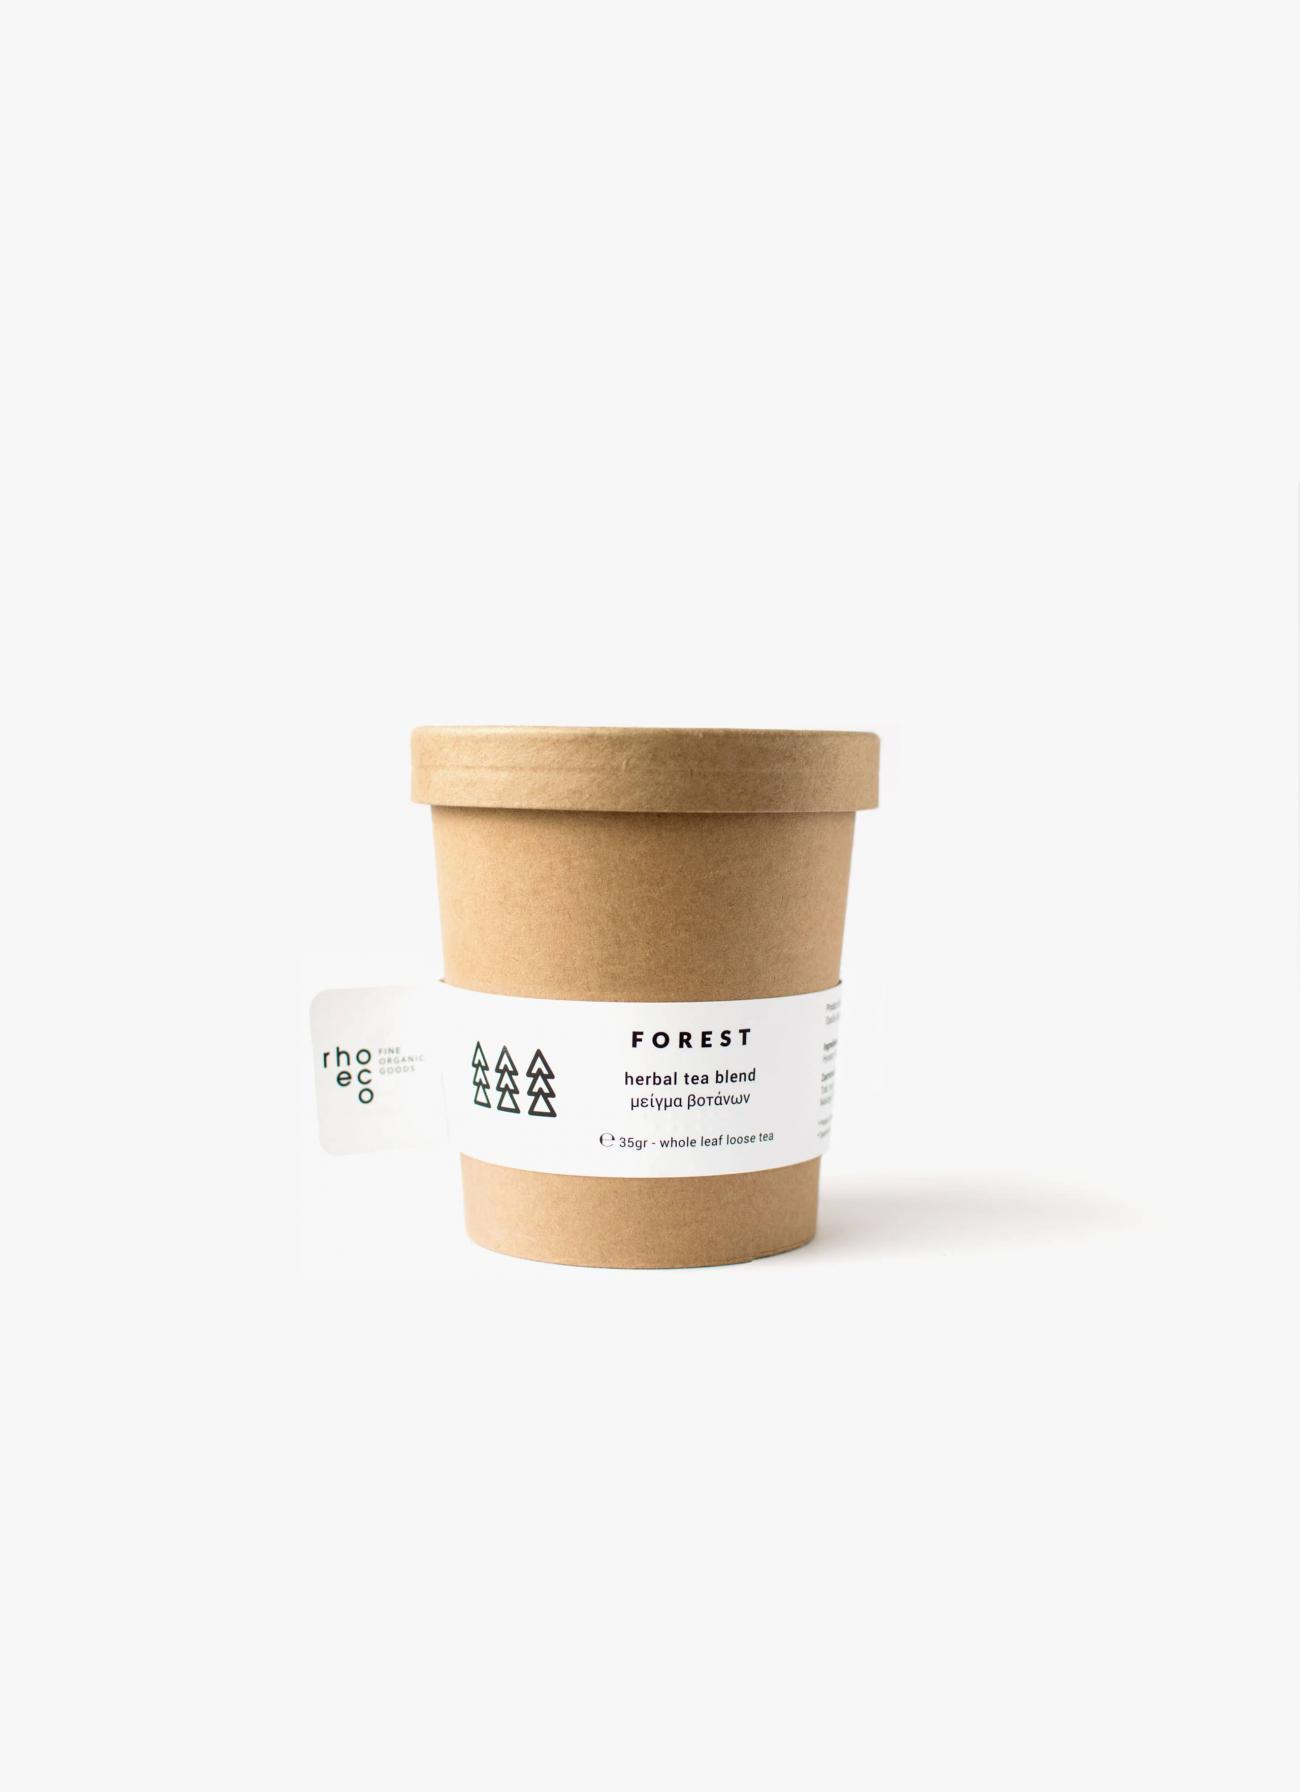 Rhoeco - Organic Tea - Drink it - Plant it - Forest